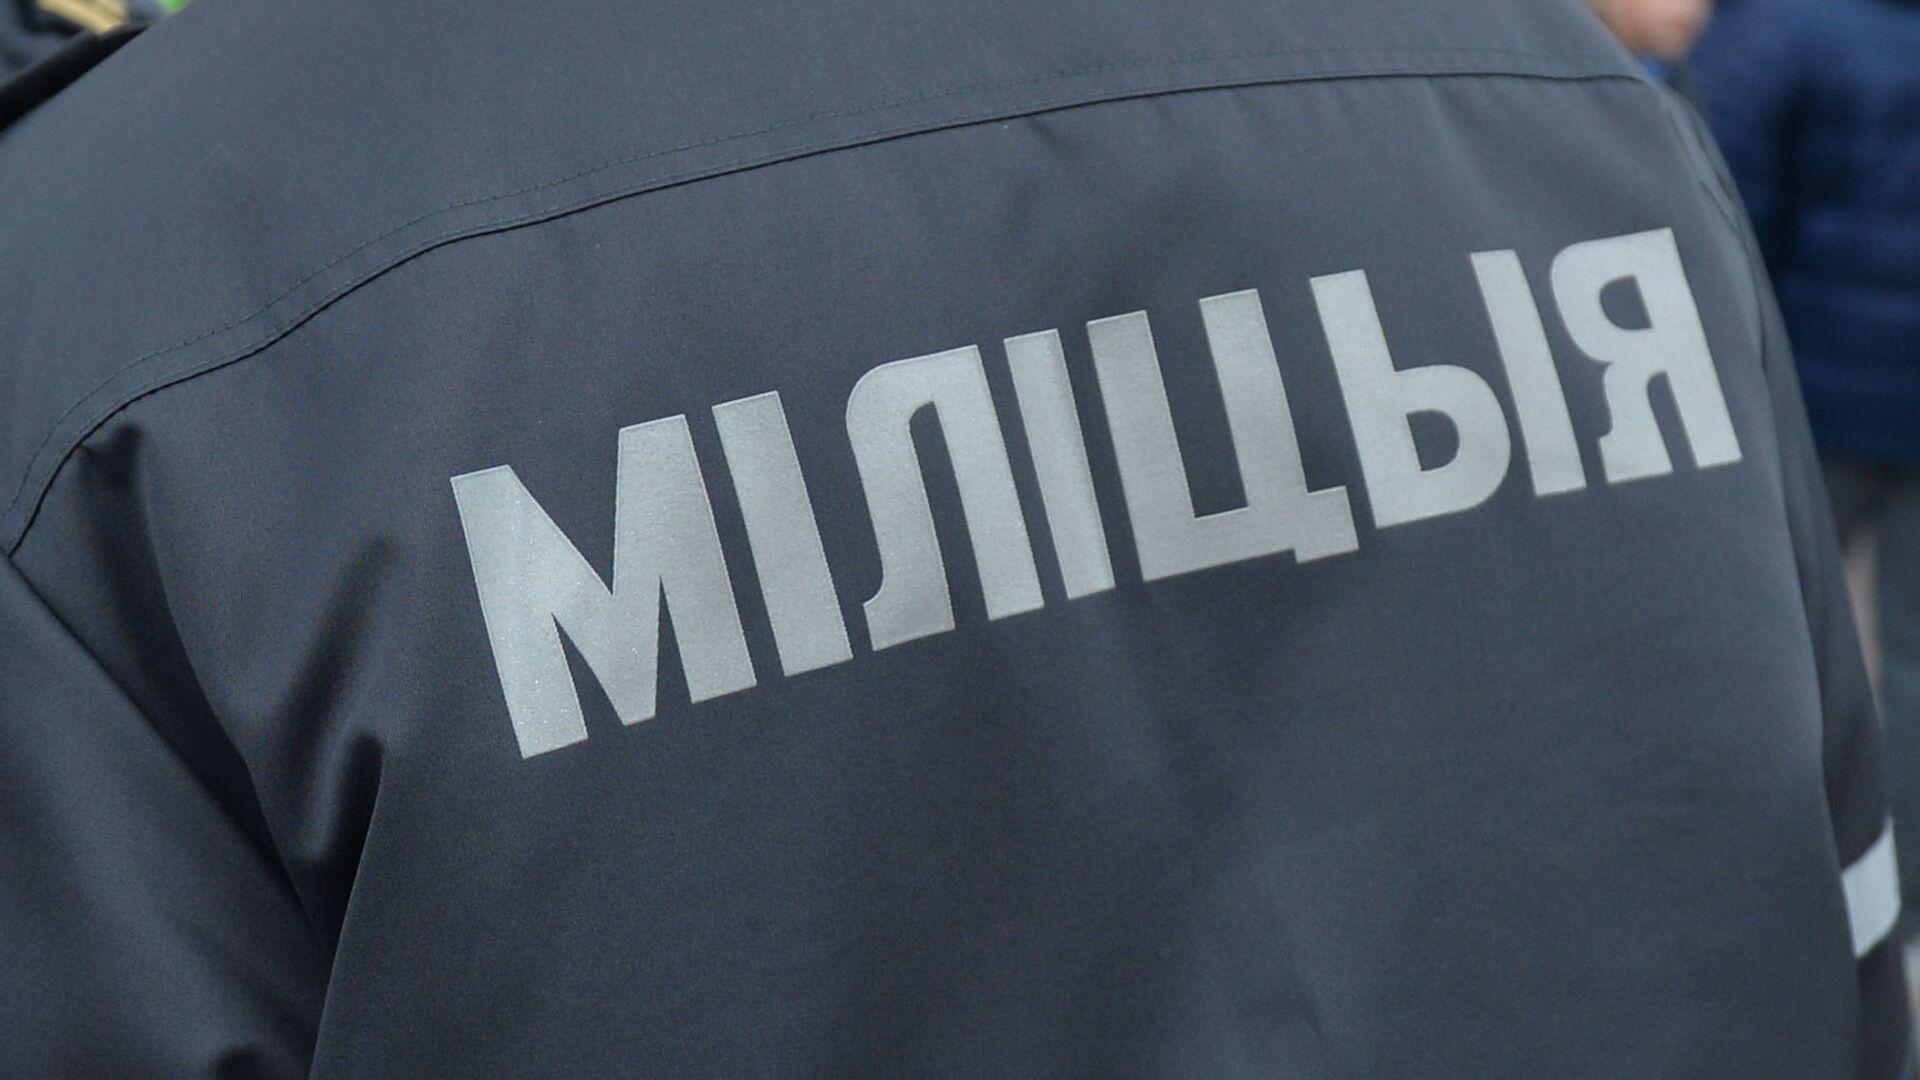 Сотрудники милиции, архивное фото - Sputnik Беларусь, 1920, 27.09.2021